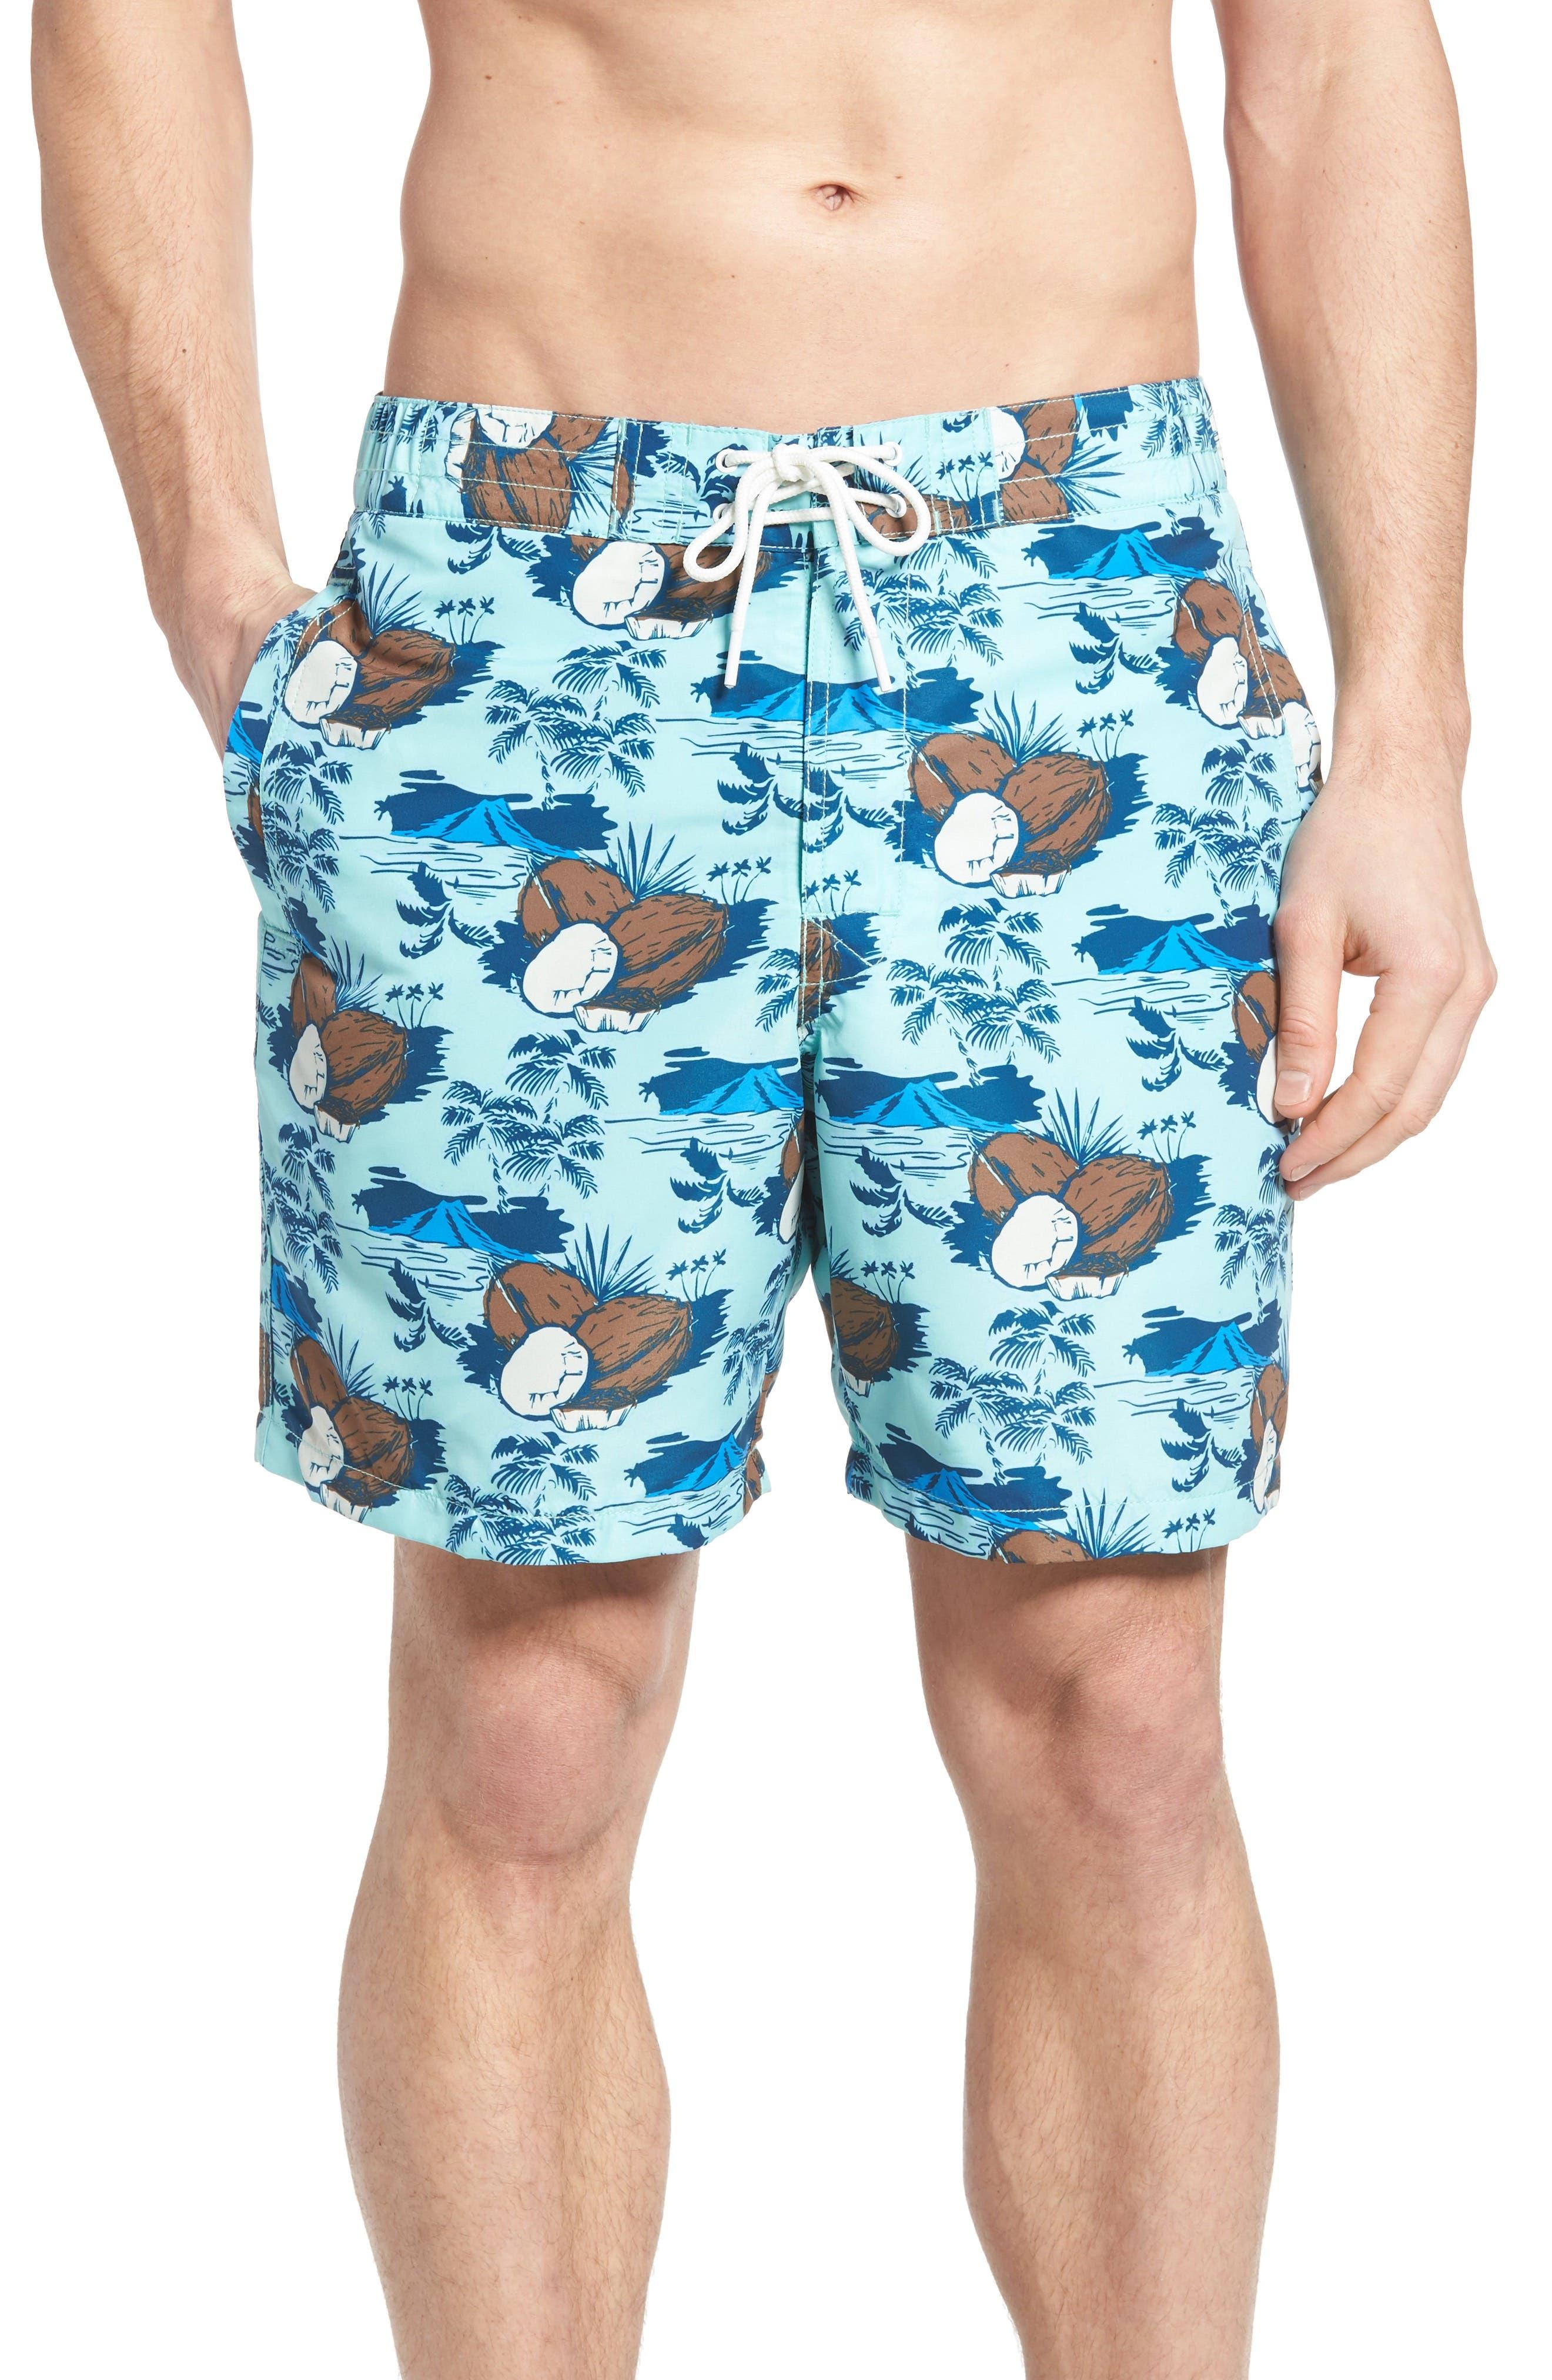 Image of RODD AND GUNN Clarks Beach Swim Trunks